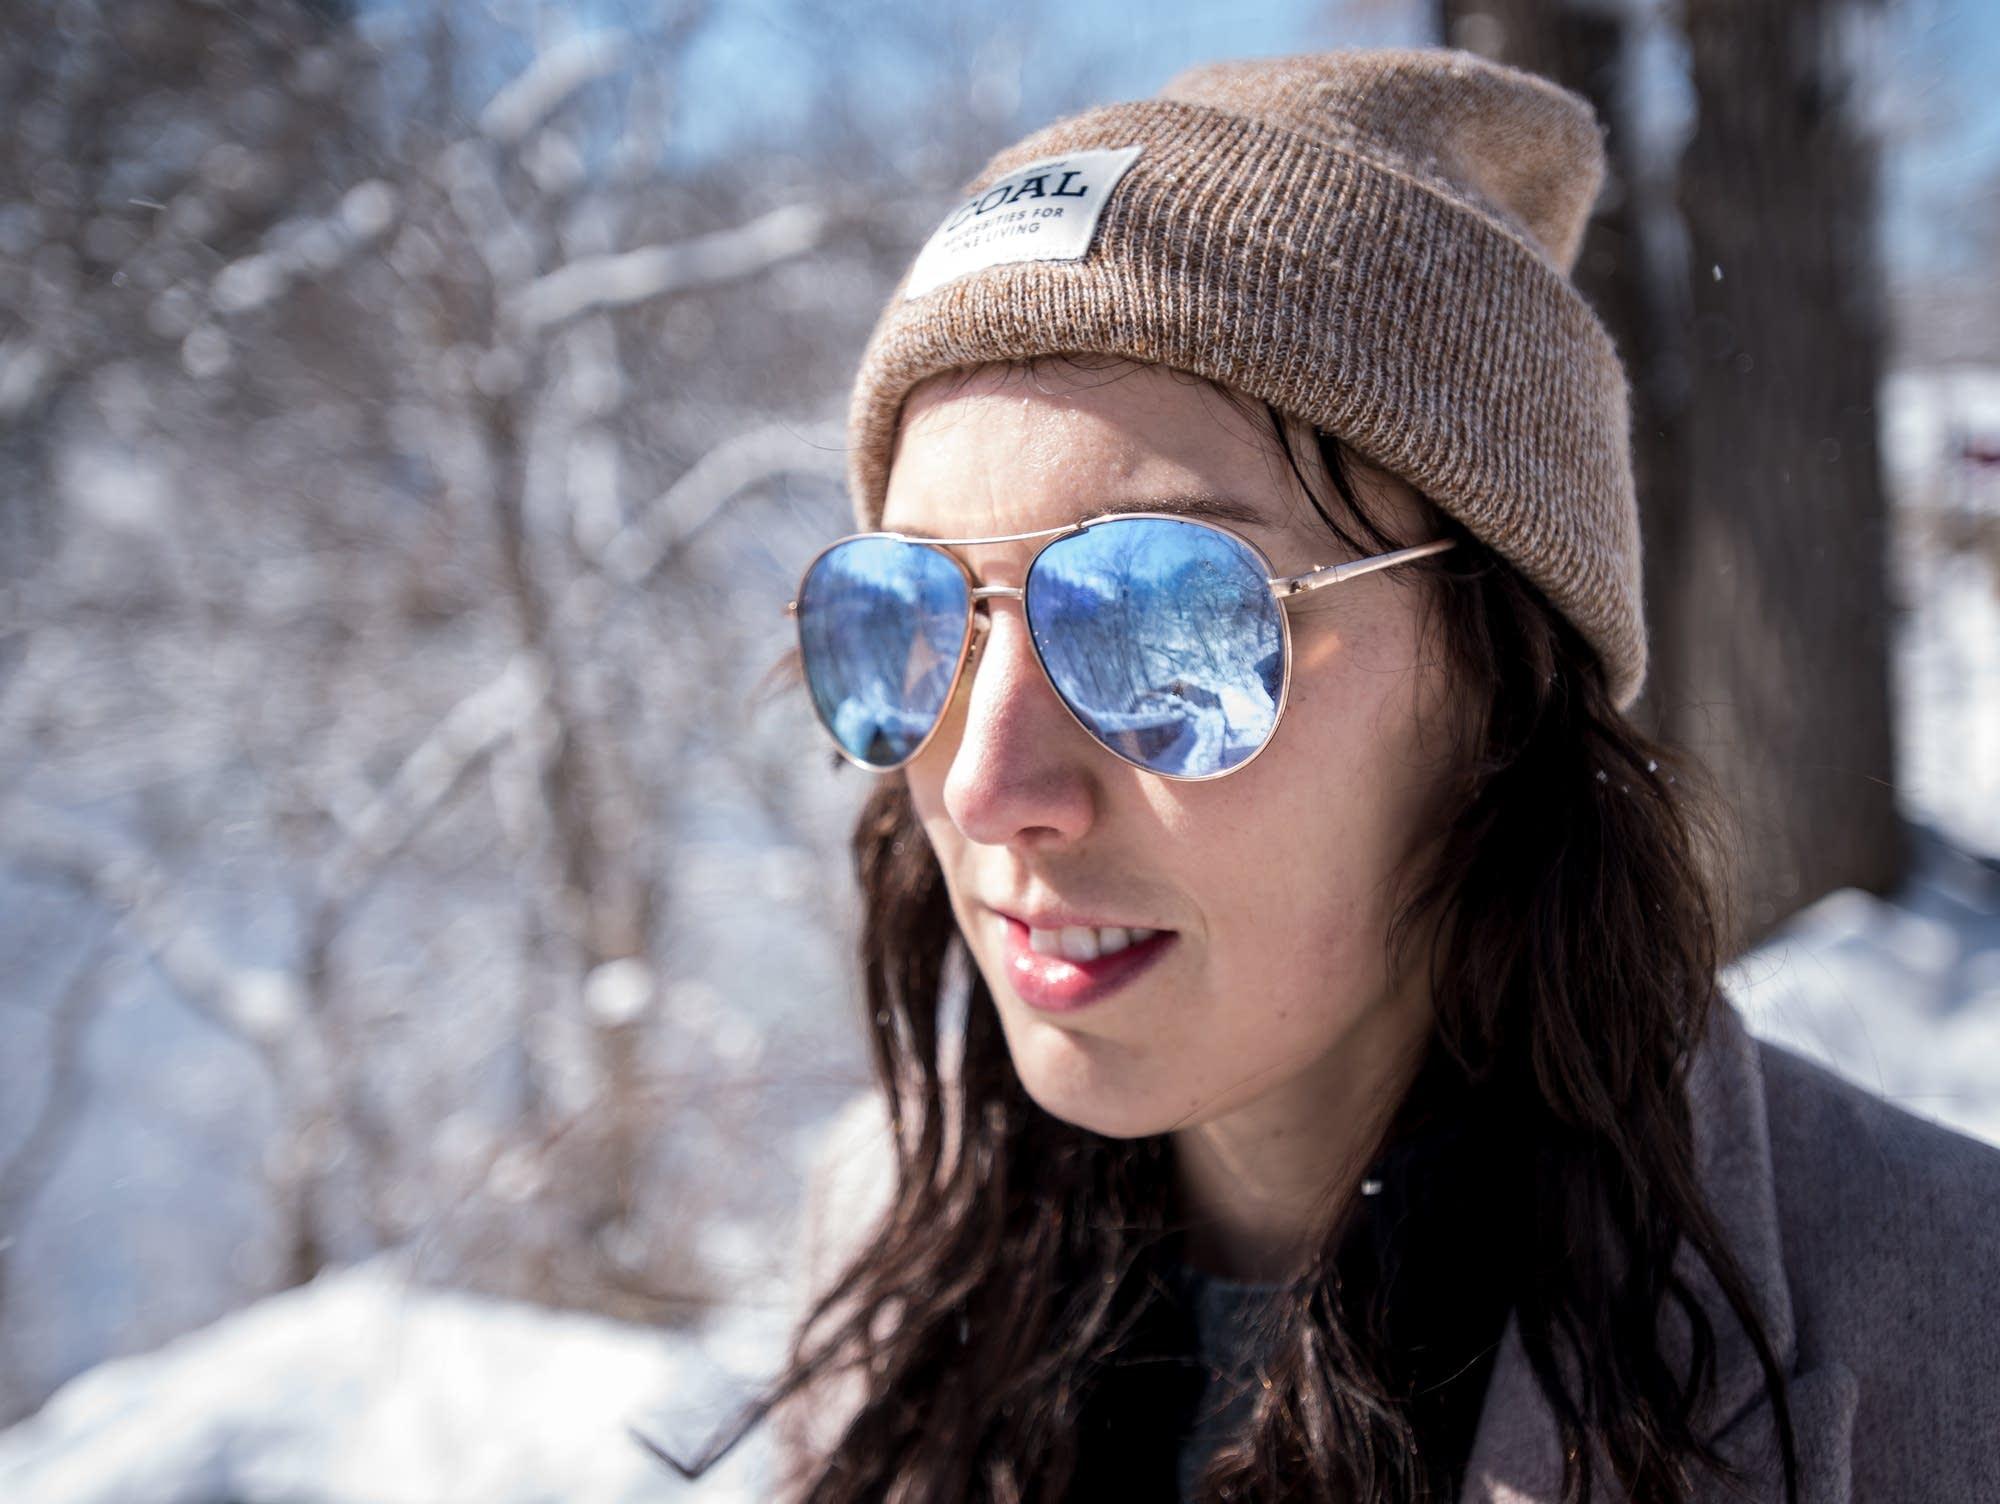 Desiree Ochs, 31, of St. Paul, visits Minnehaha Falls